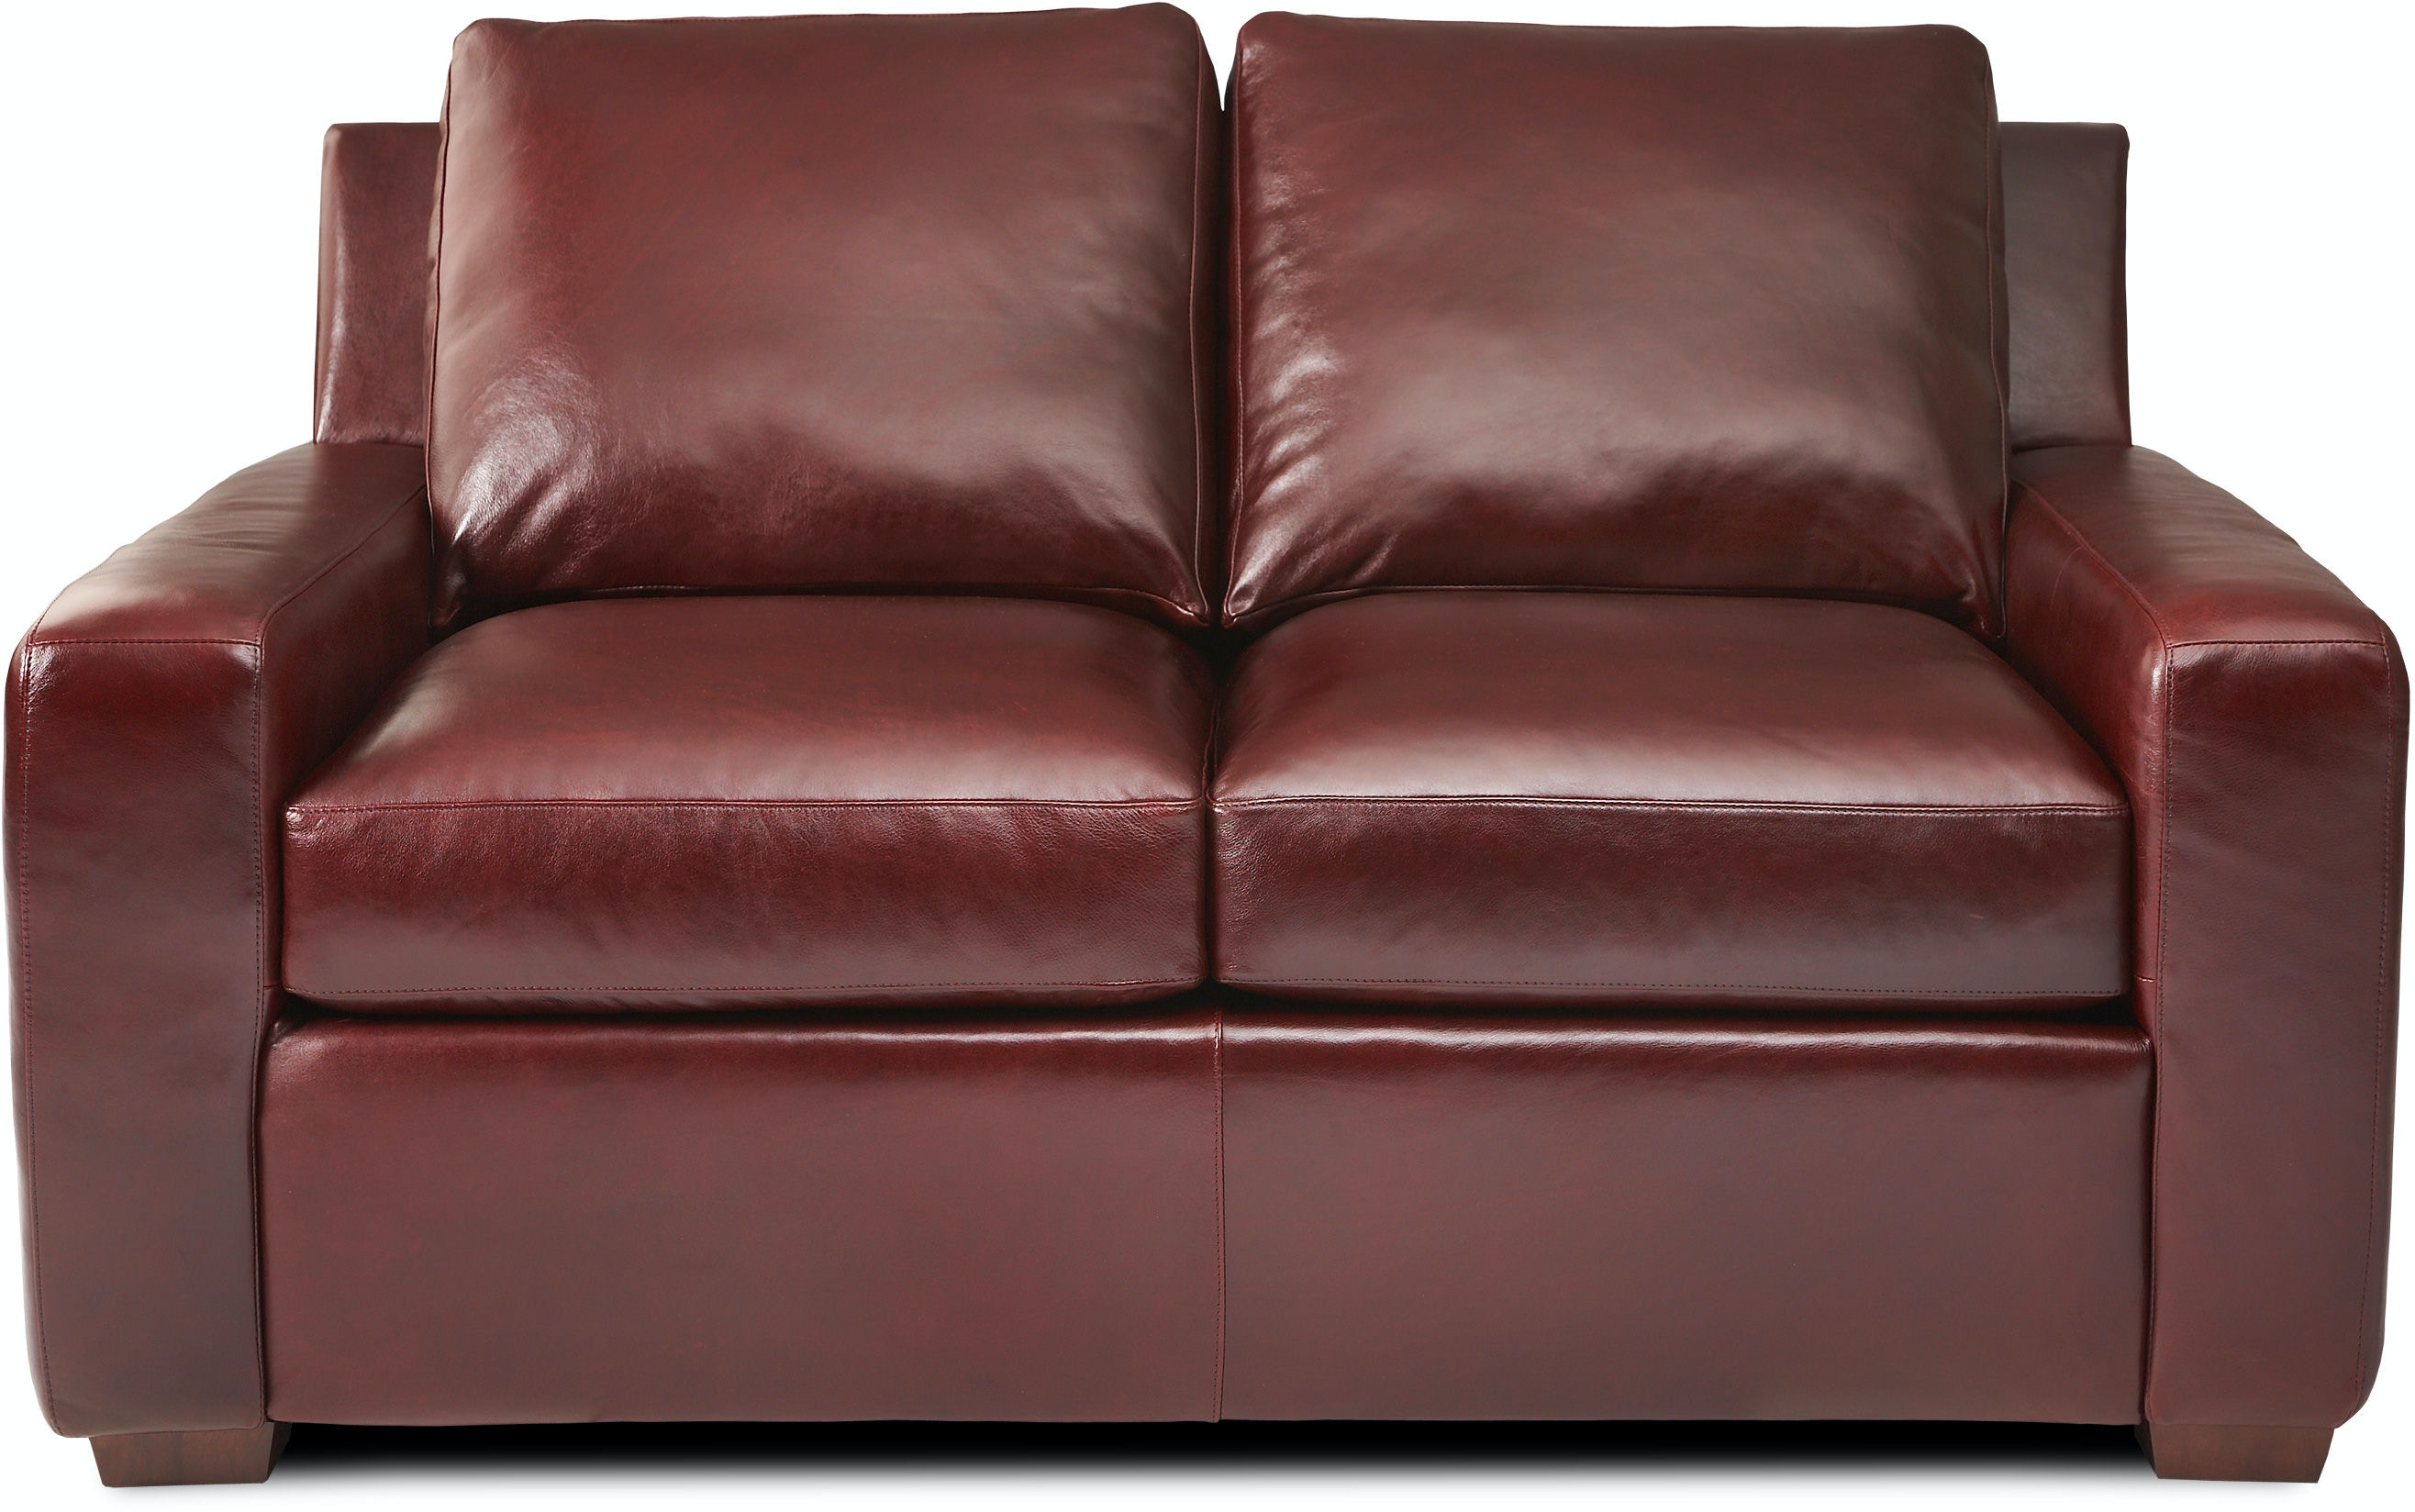 Two Cushion Loveseat Lis Lvs St